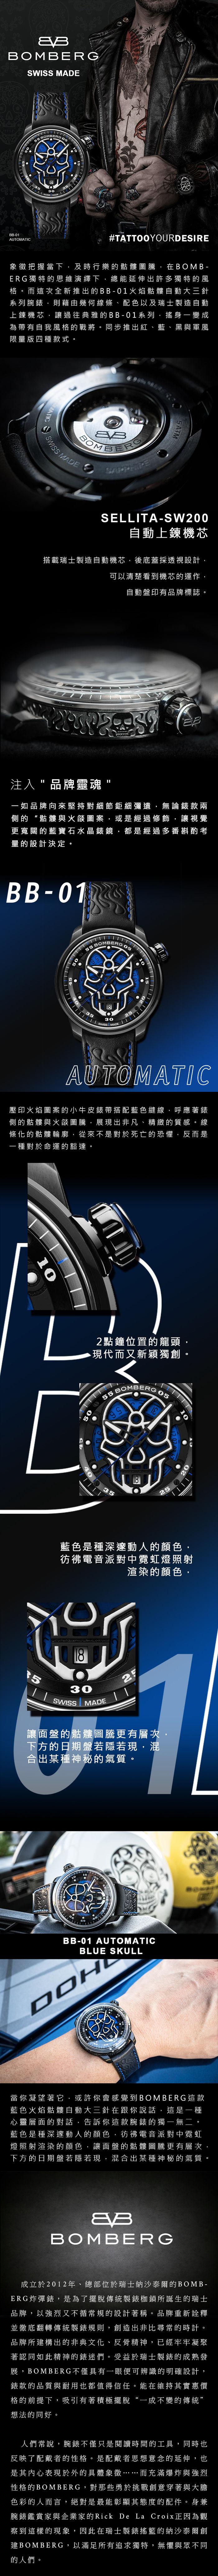 BOMBERG|BB-01 自動機械系列 藍色火焰骷髏自動大三針-錶徑 43mm